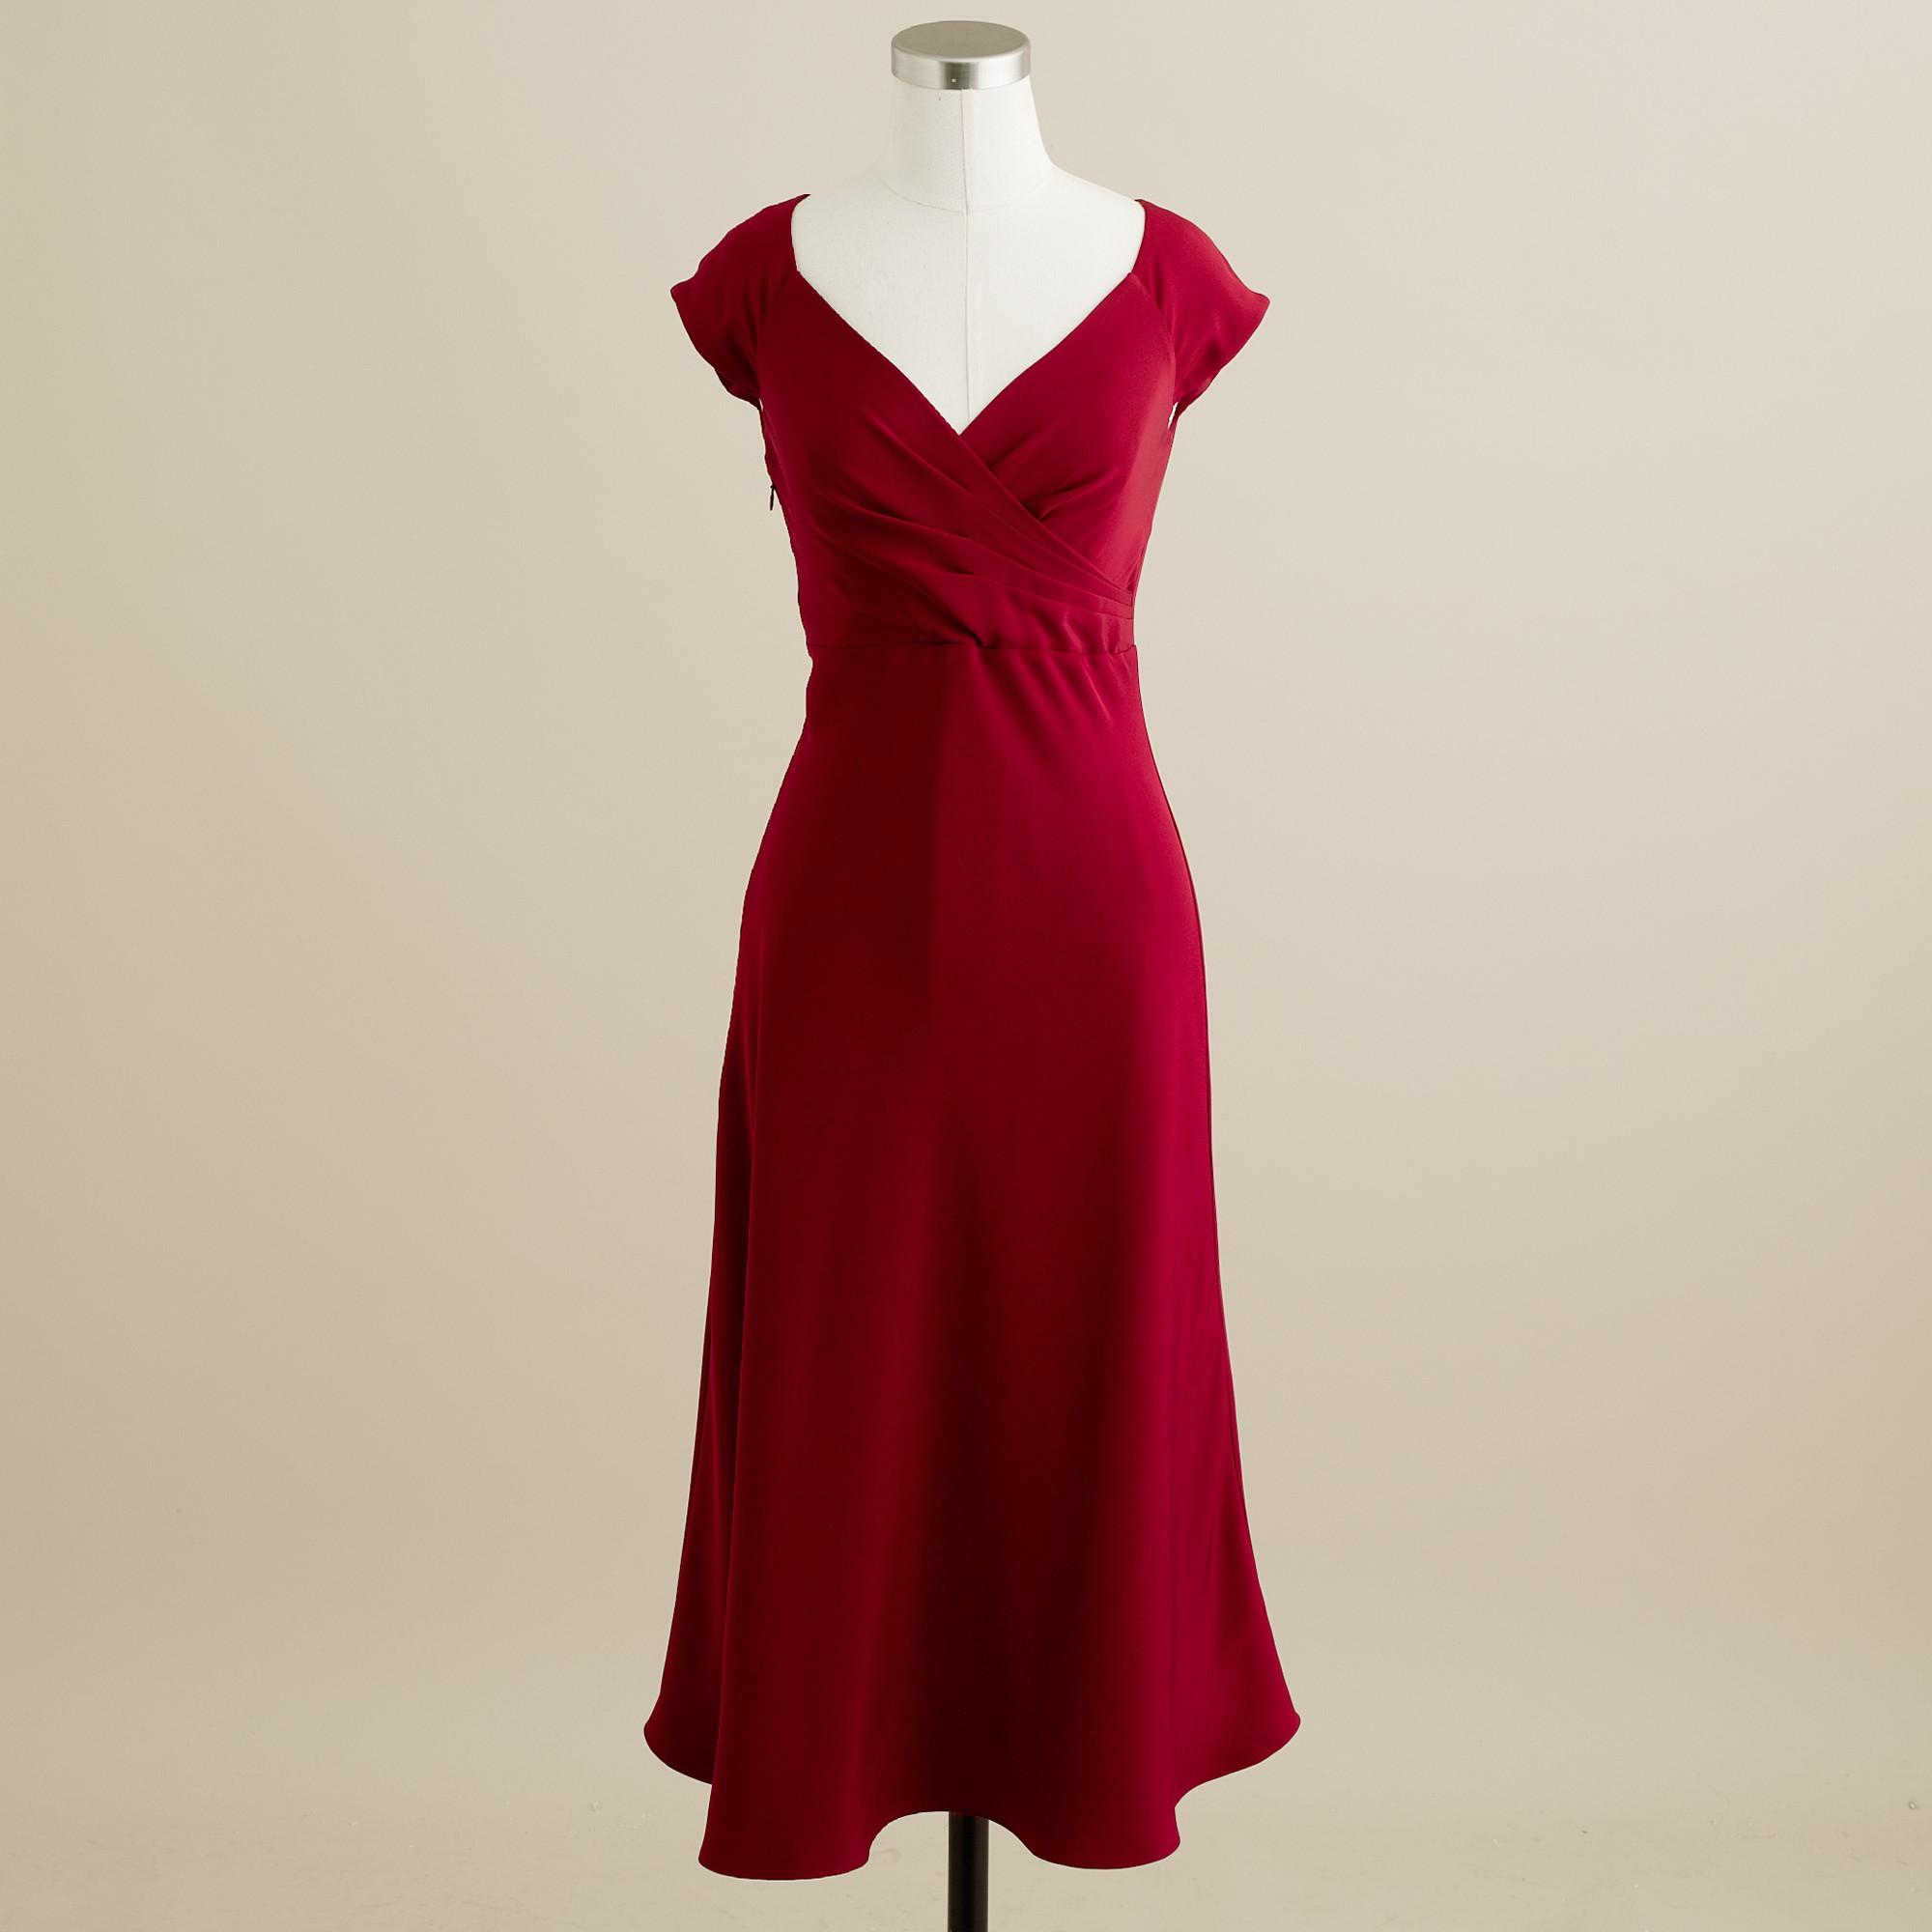 J Crew Cecelia Dress In Silk Tricotine In Red Vintage